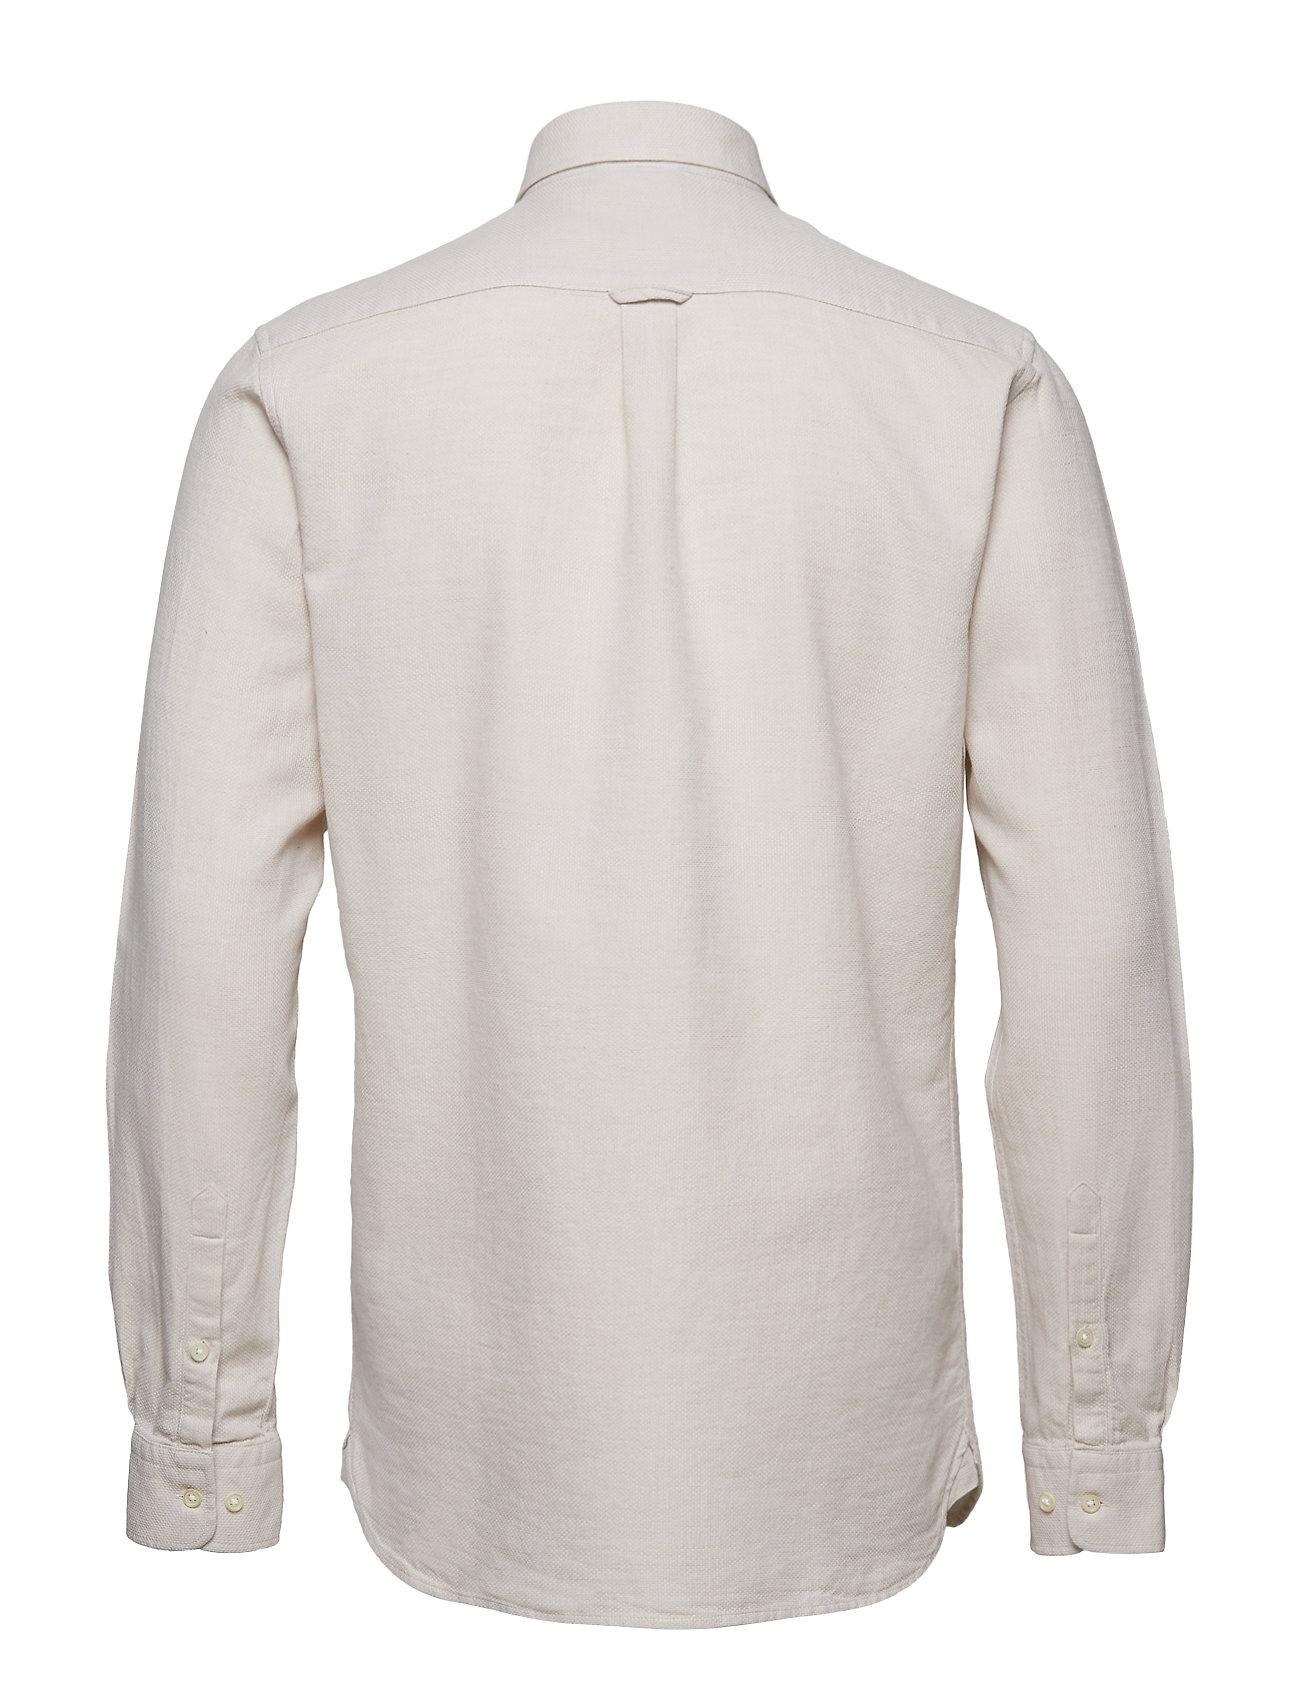 GrayKnowledge Apparel Cotton Shirtlight Larch Feather Ls H9YeDWE2I